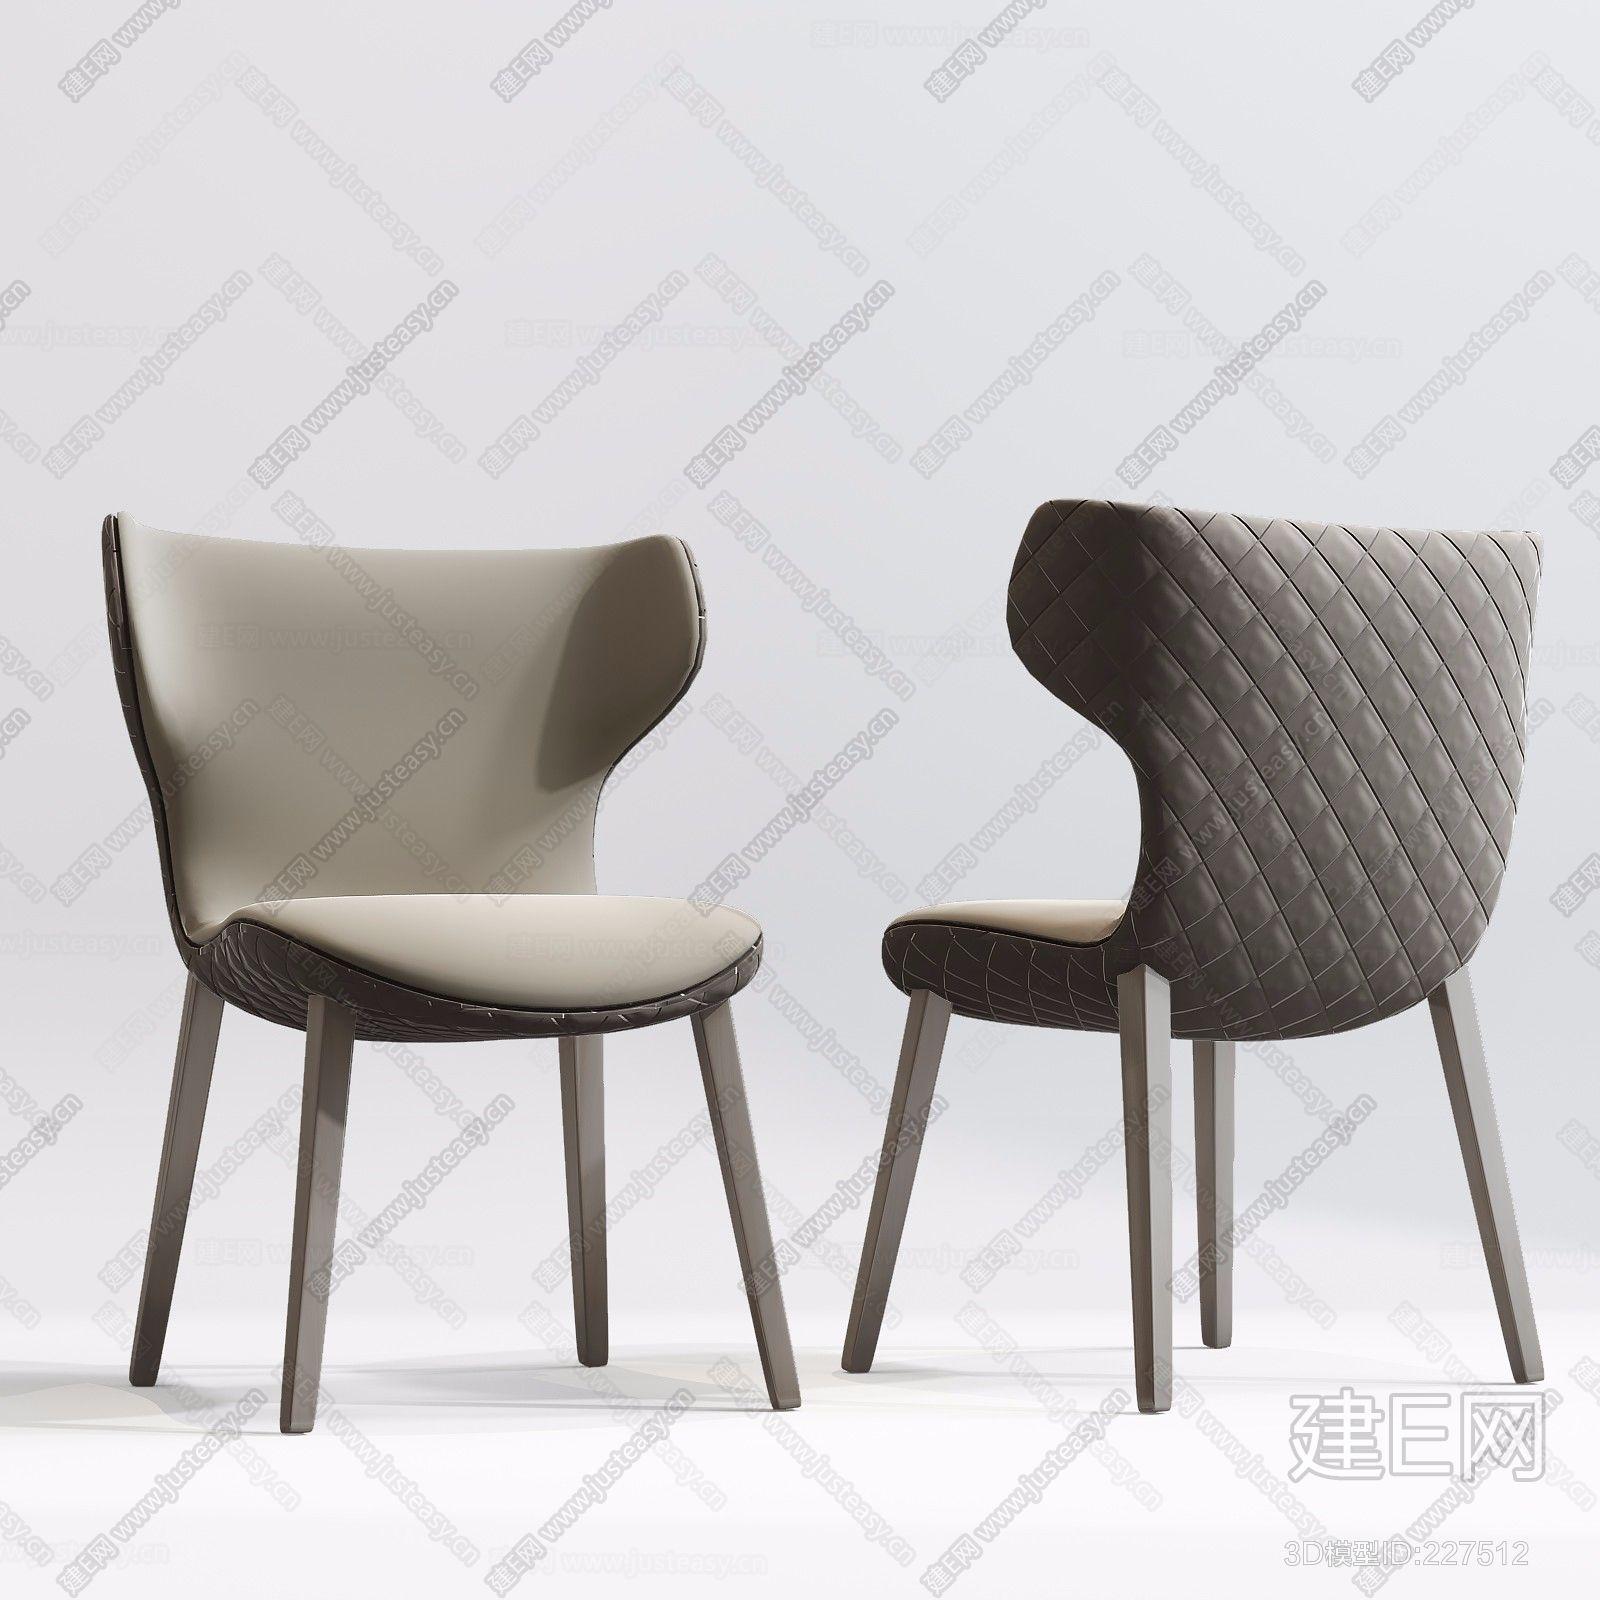 意大利宾利Bentley Home现代单人椅子ID:227512